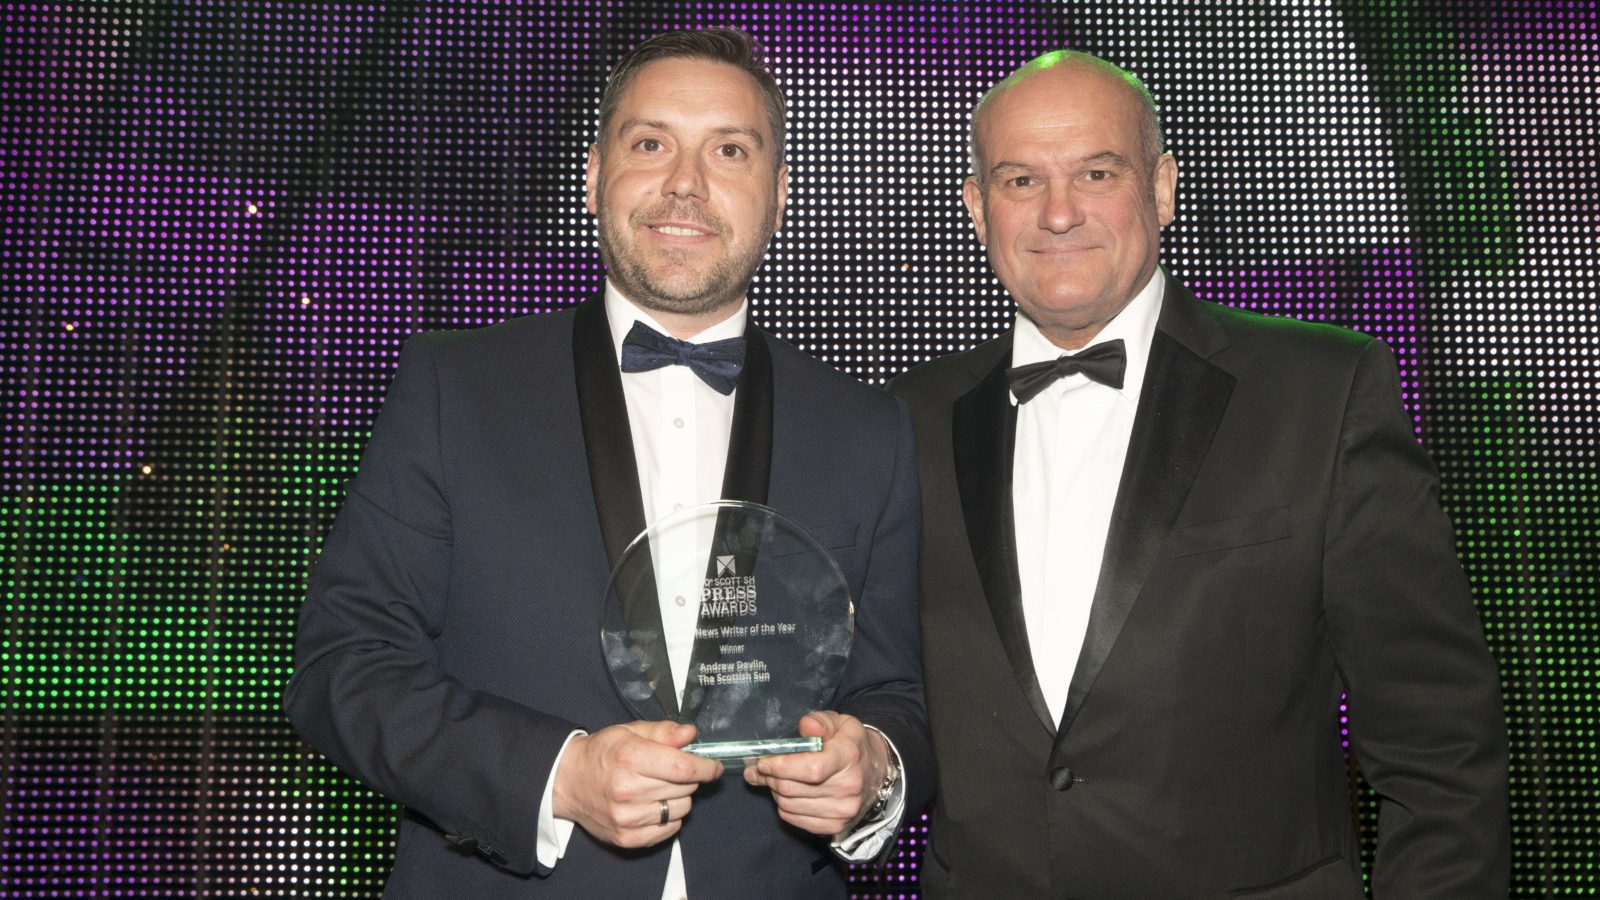 Sports News Writer of the Year Winner Andrew Devlin, The Scottish Sun